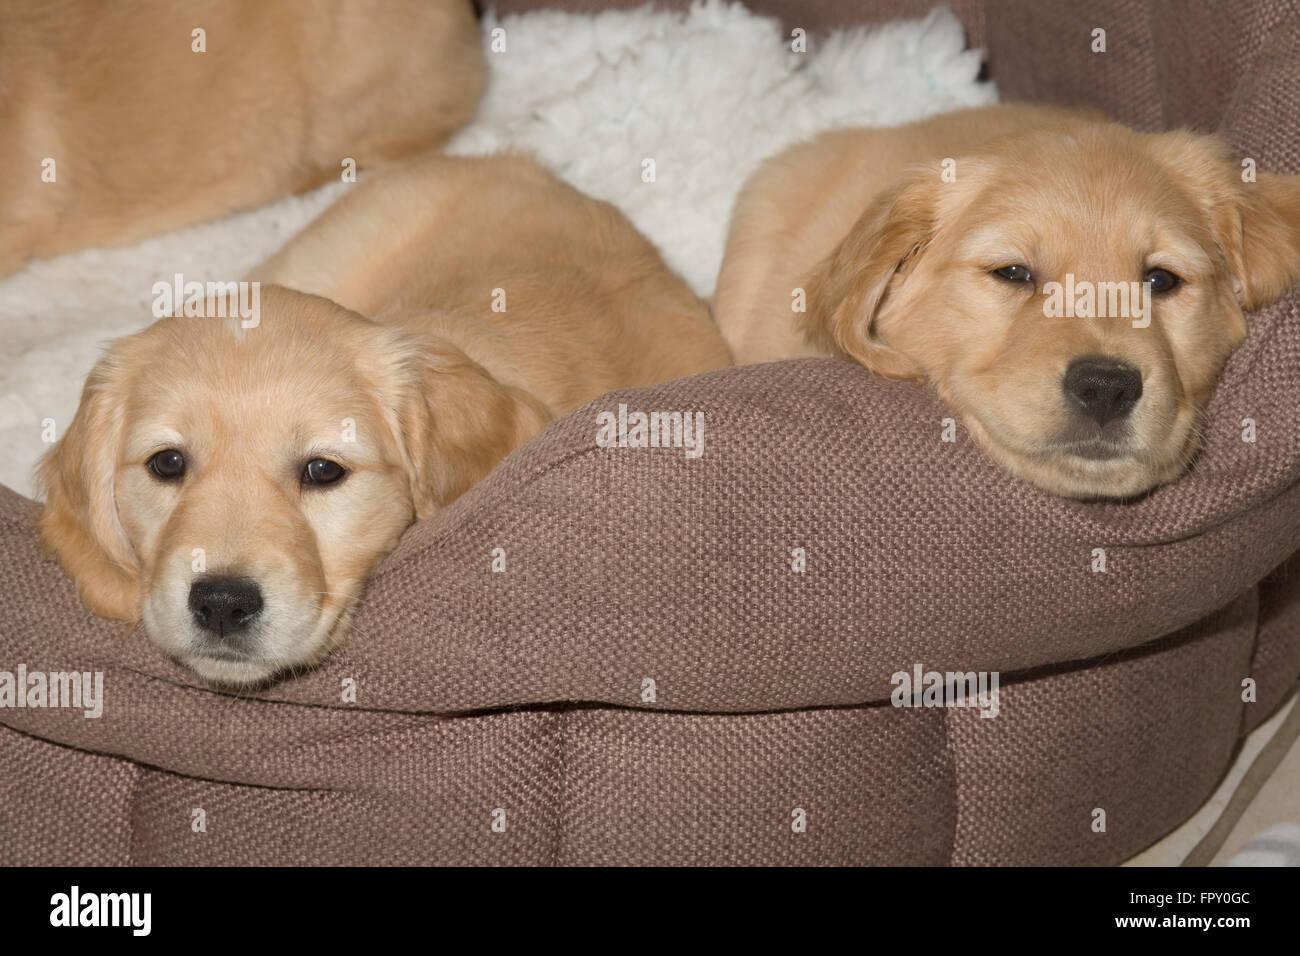 golden retriever puppies resting on fleece blanket on soft basket - Stock Image